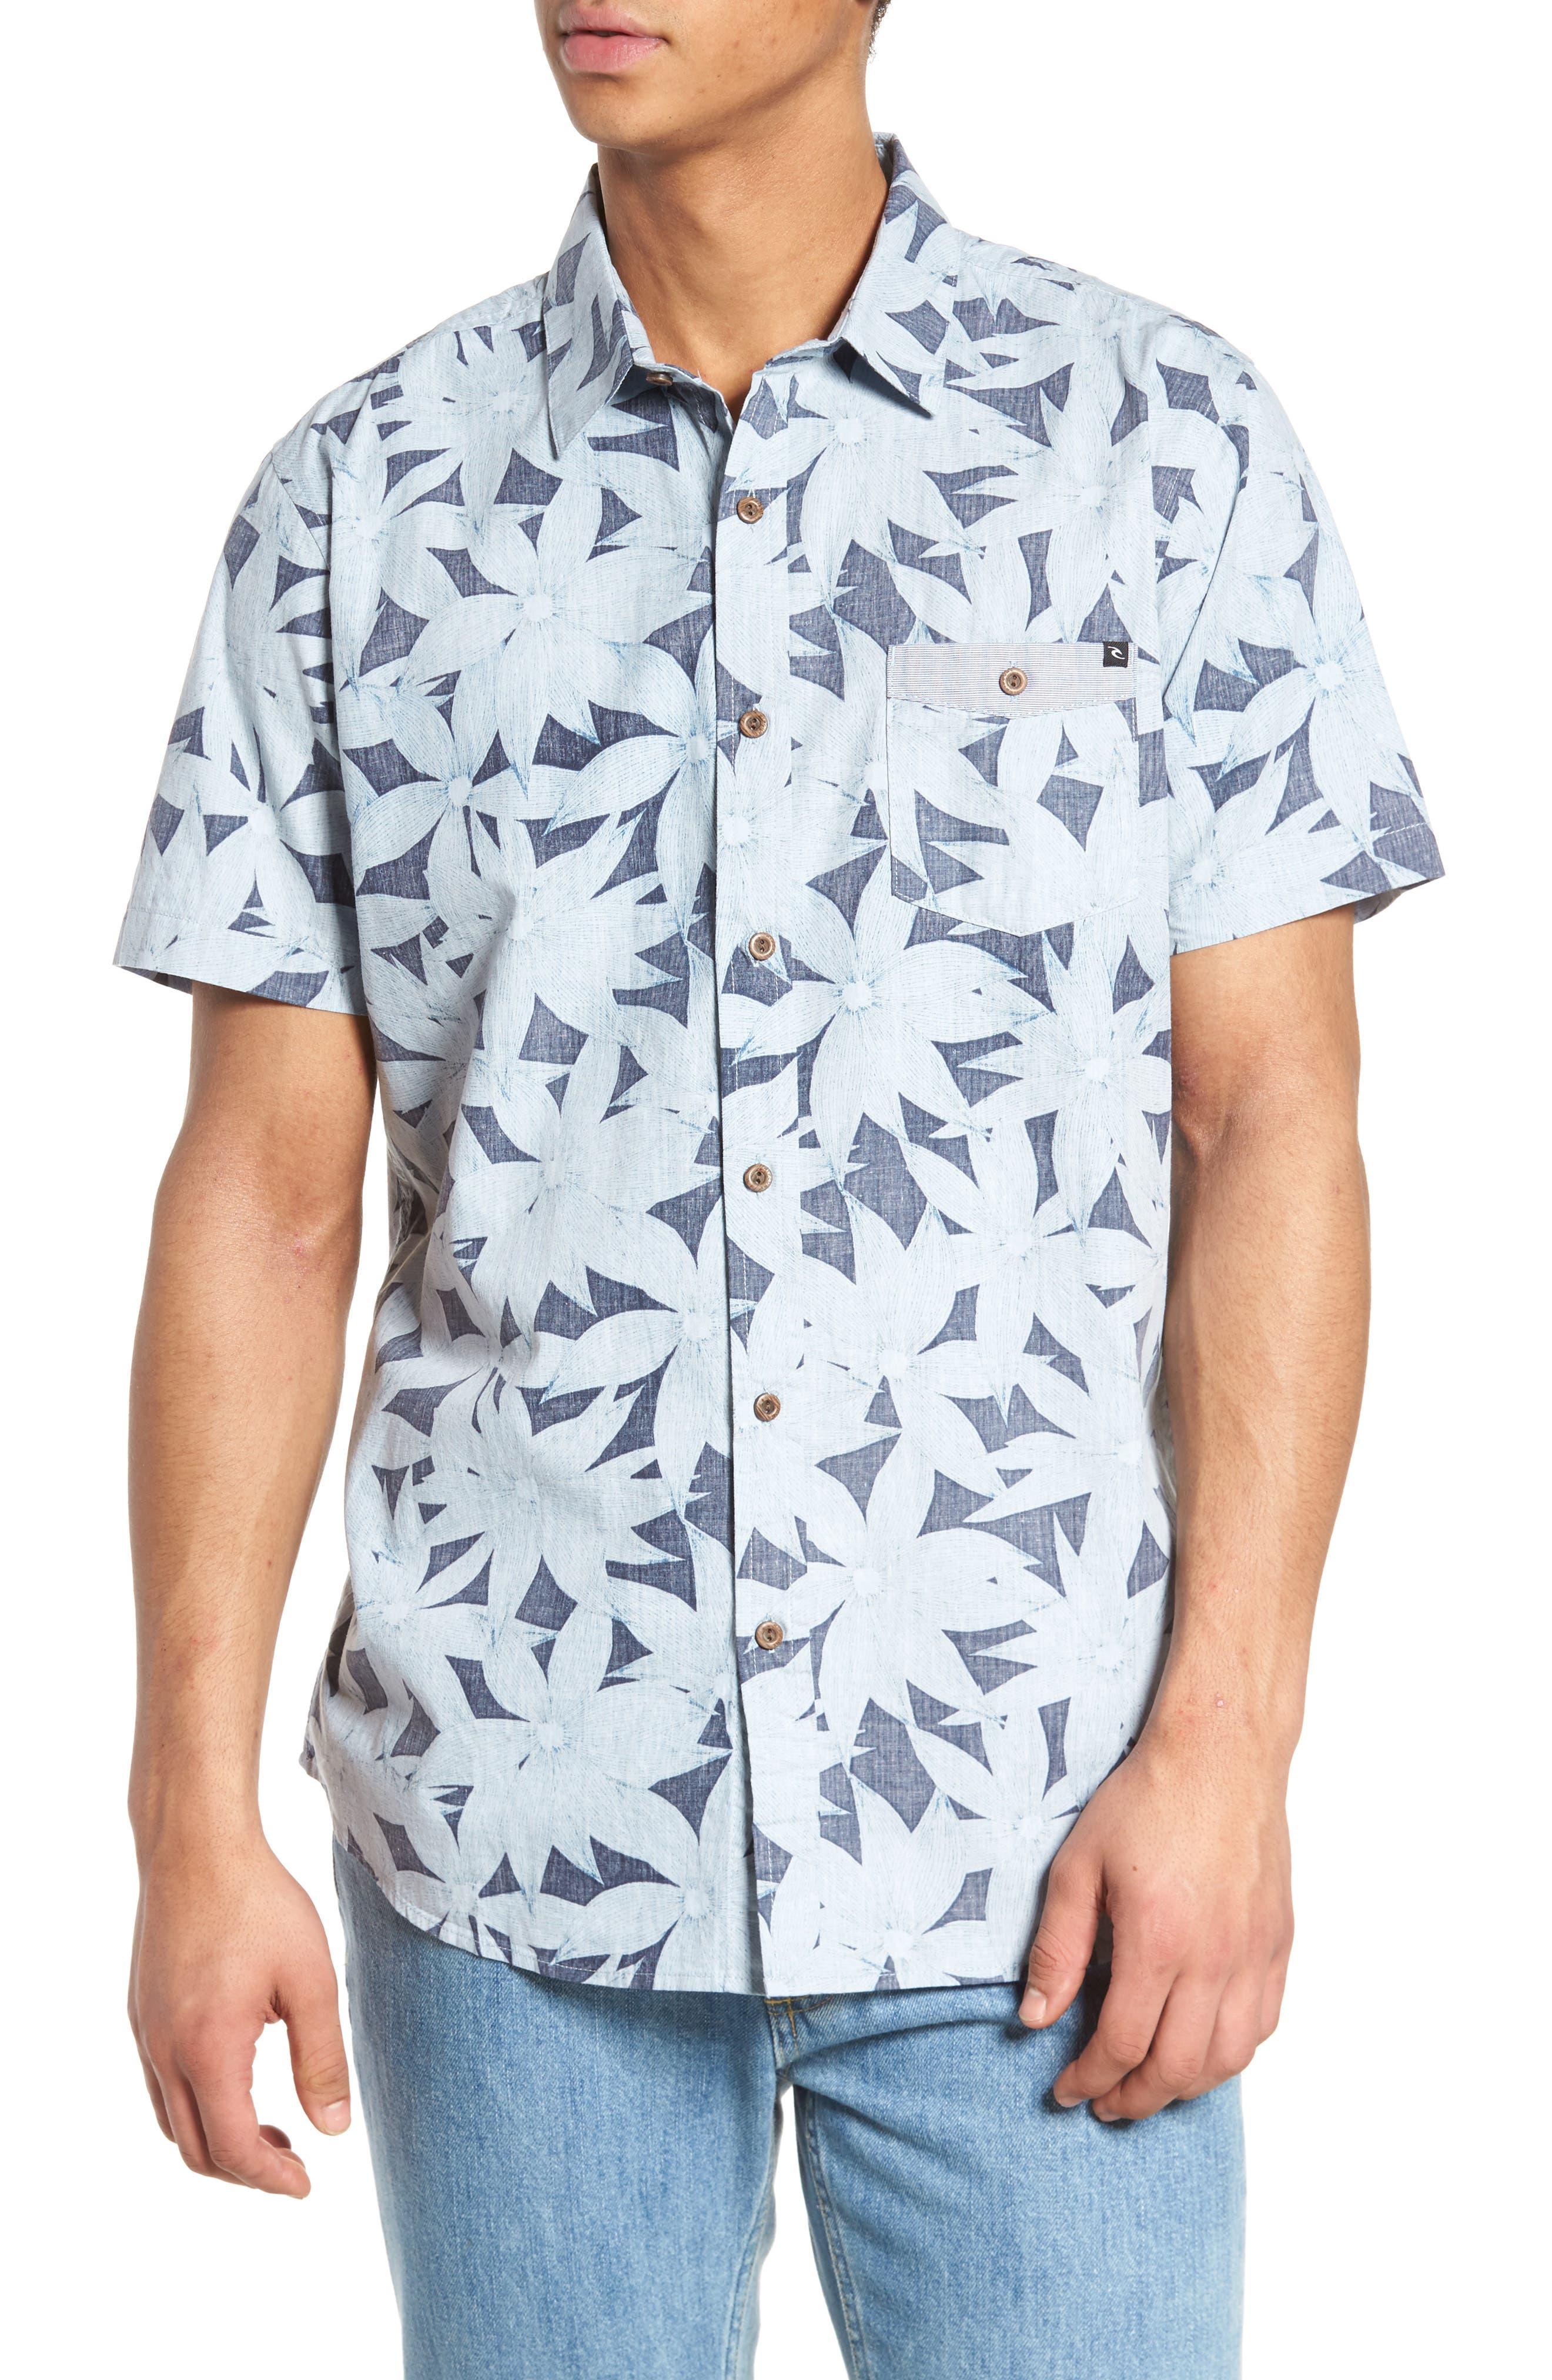 Rip Curl Stalked Woven Sport Shirt